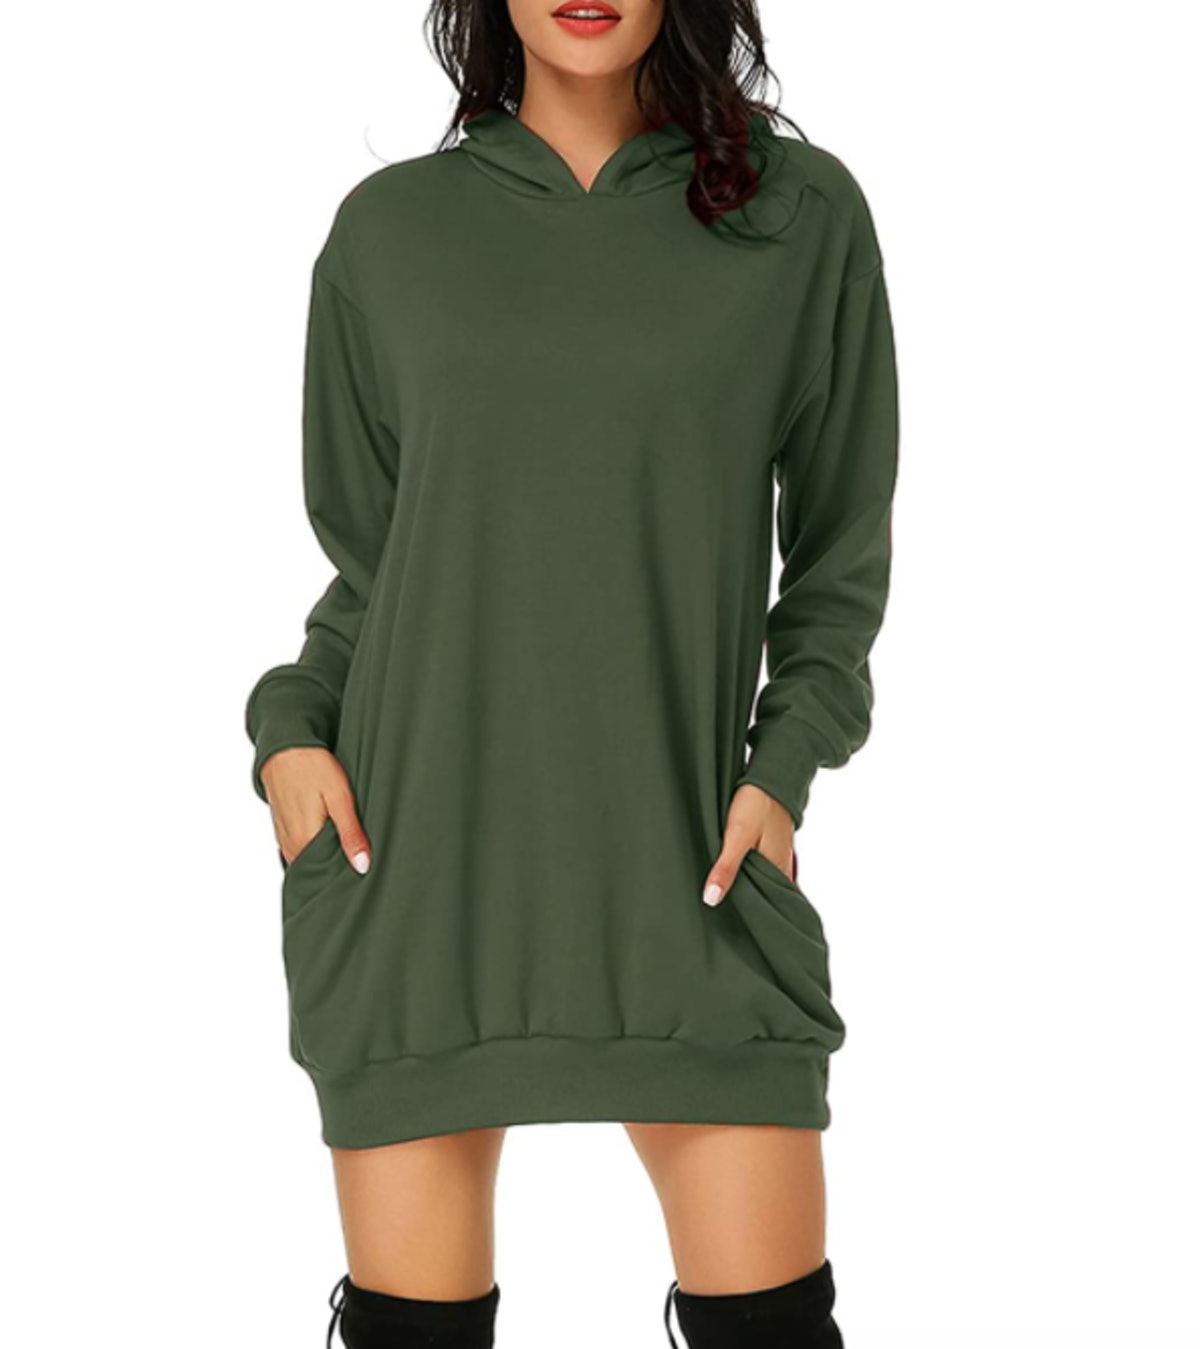 Auxo Women's Long Sleeve Hooded Pockets Pullover Hoodie Dress Tunic Sweatshirt